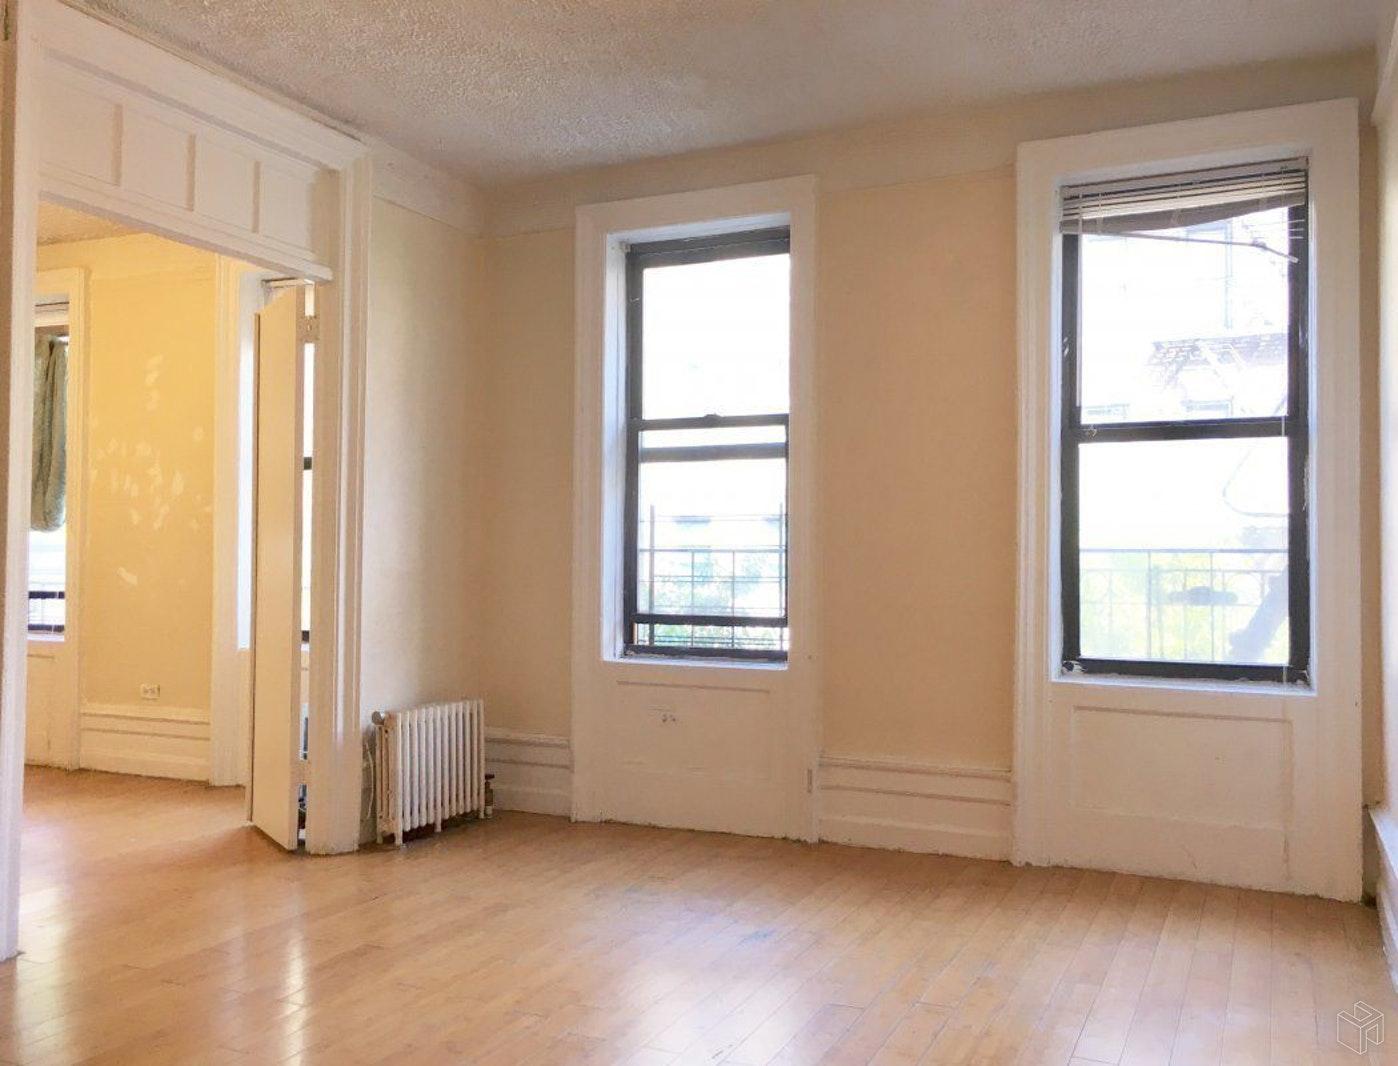 606 WEST 191ST STREET 24, Washington Heights, $2,400, Web #: 19481545